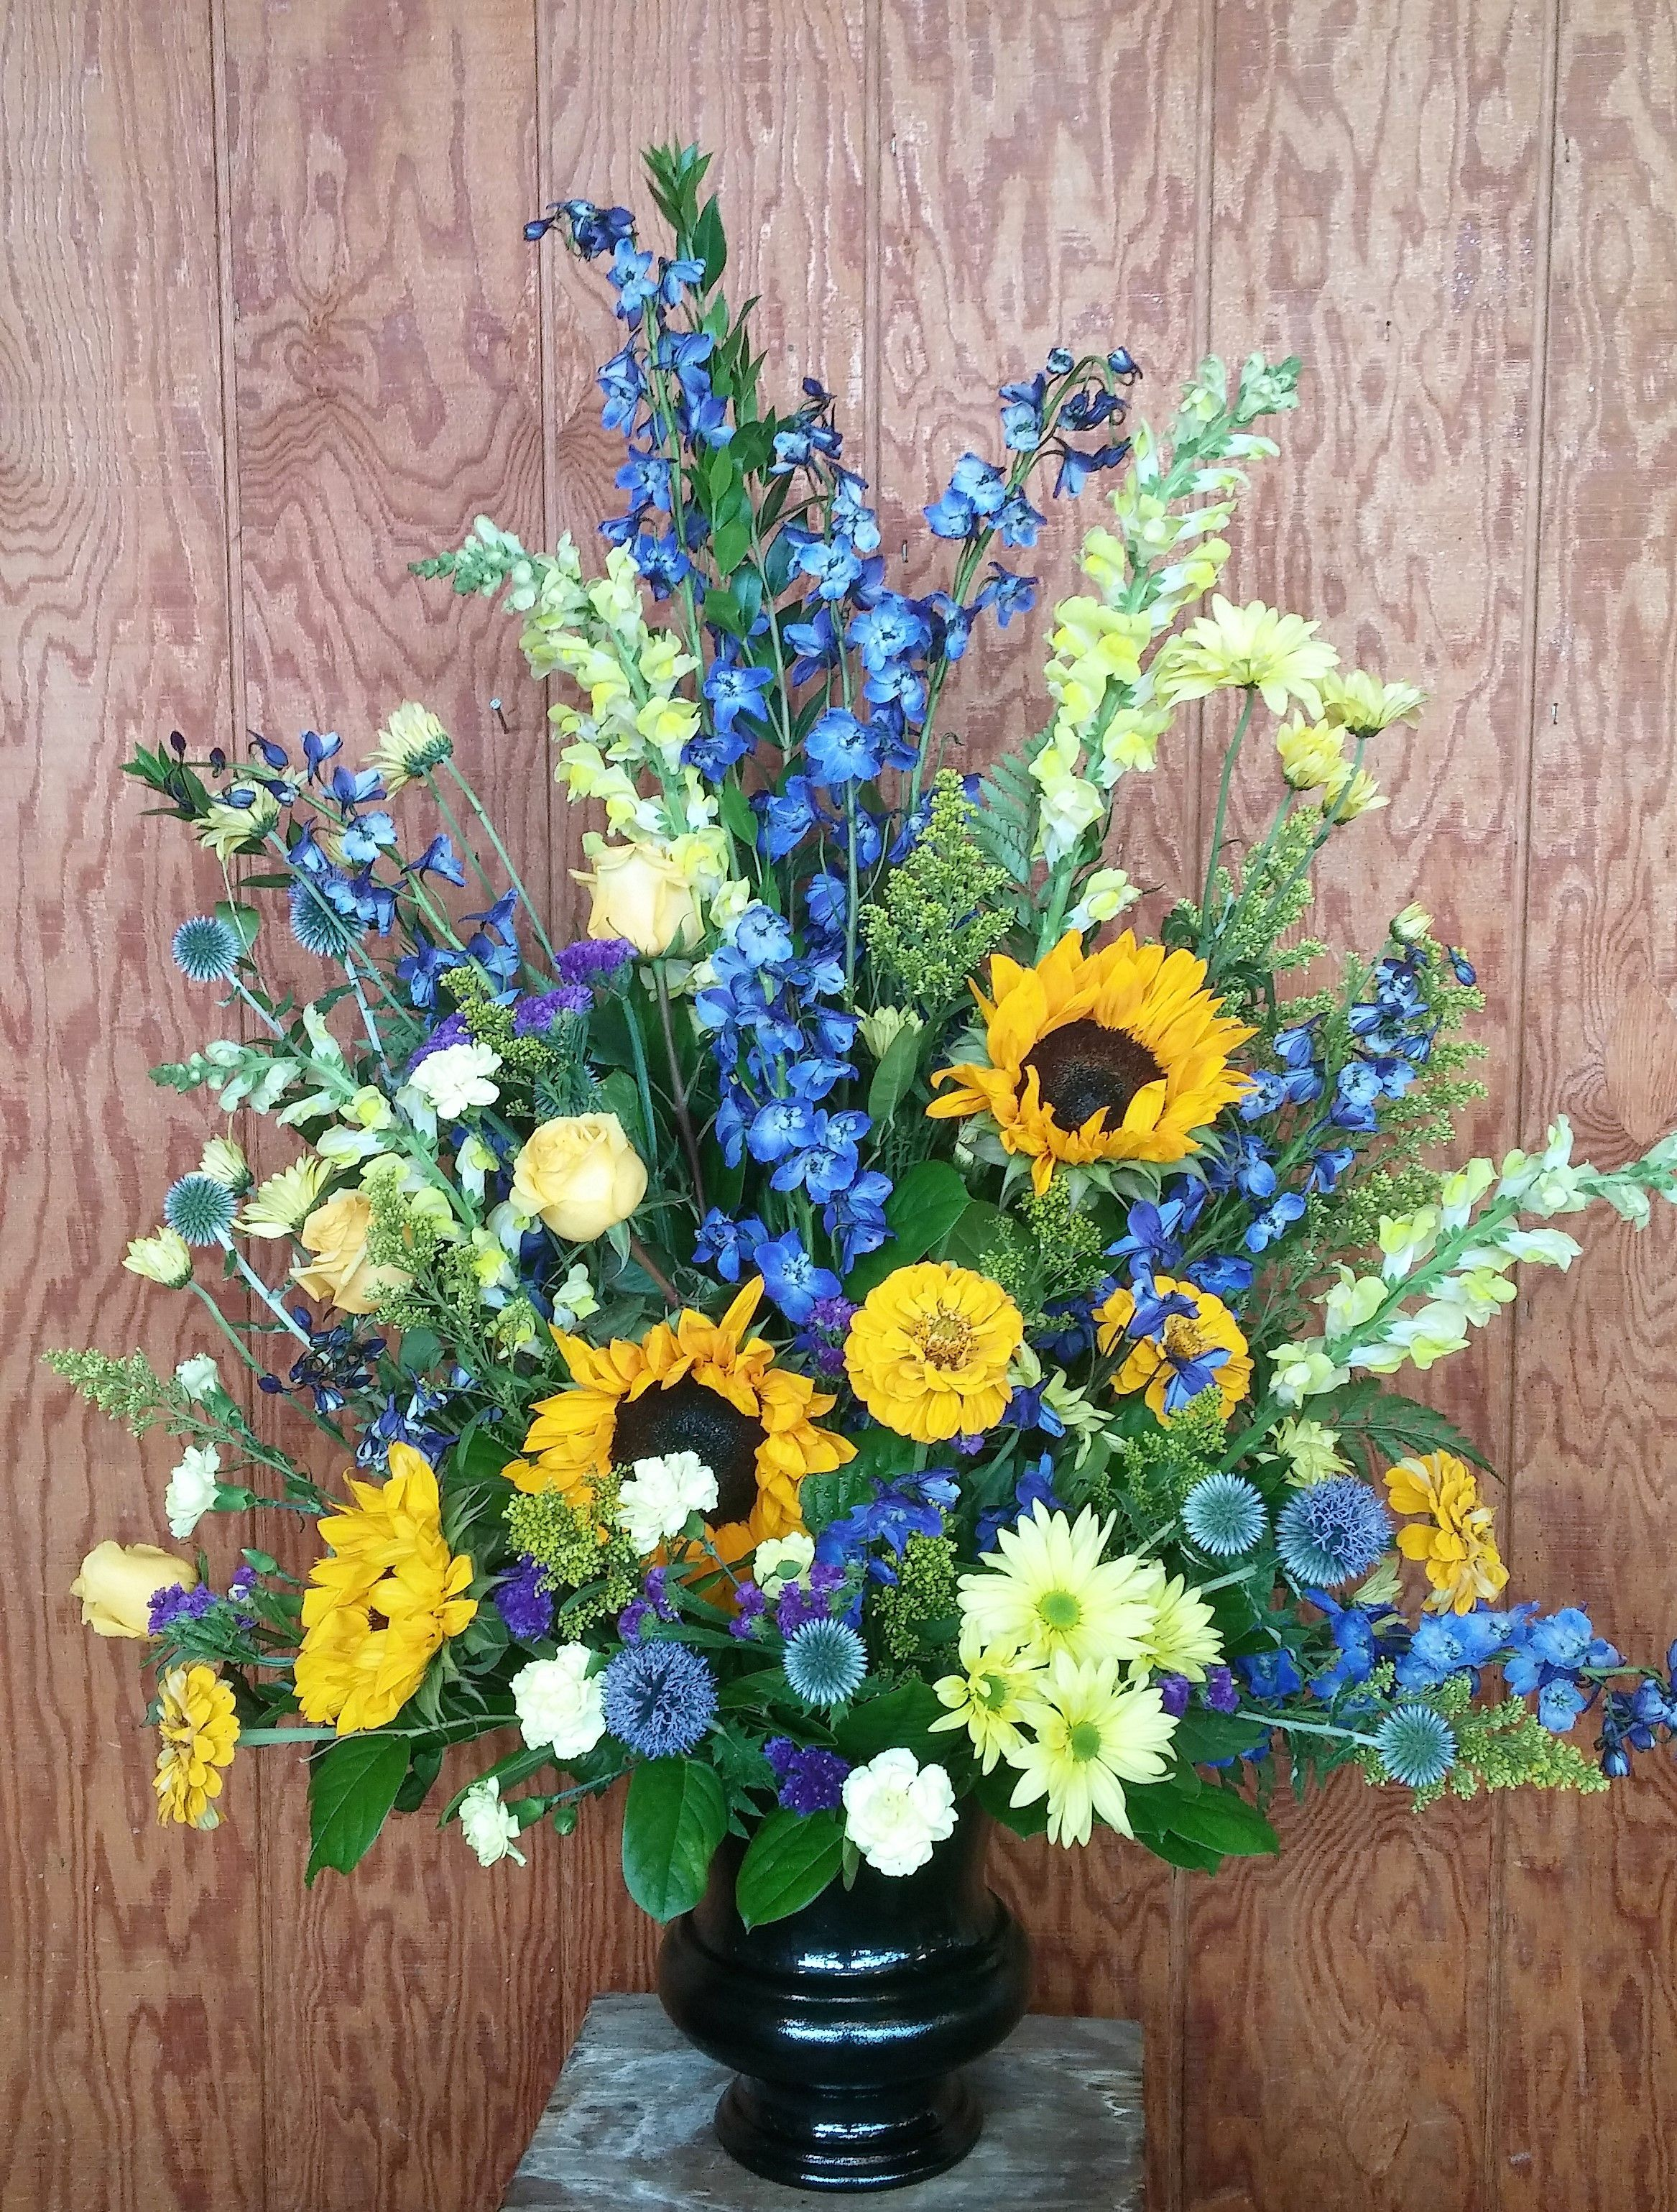 tall podium arrangement. U of M flower arrangement, blue